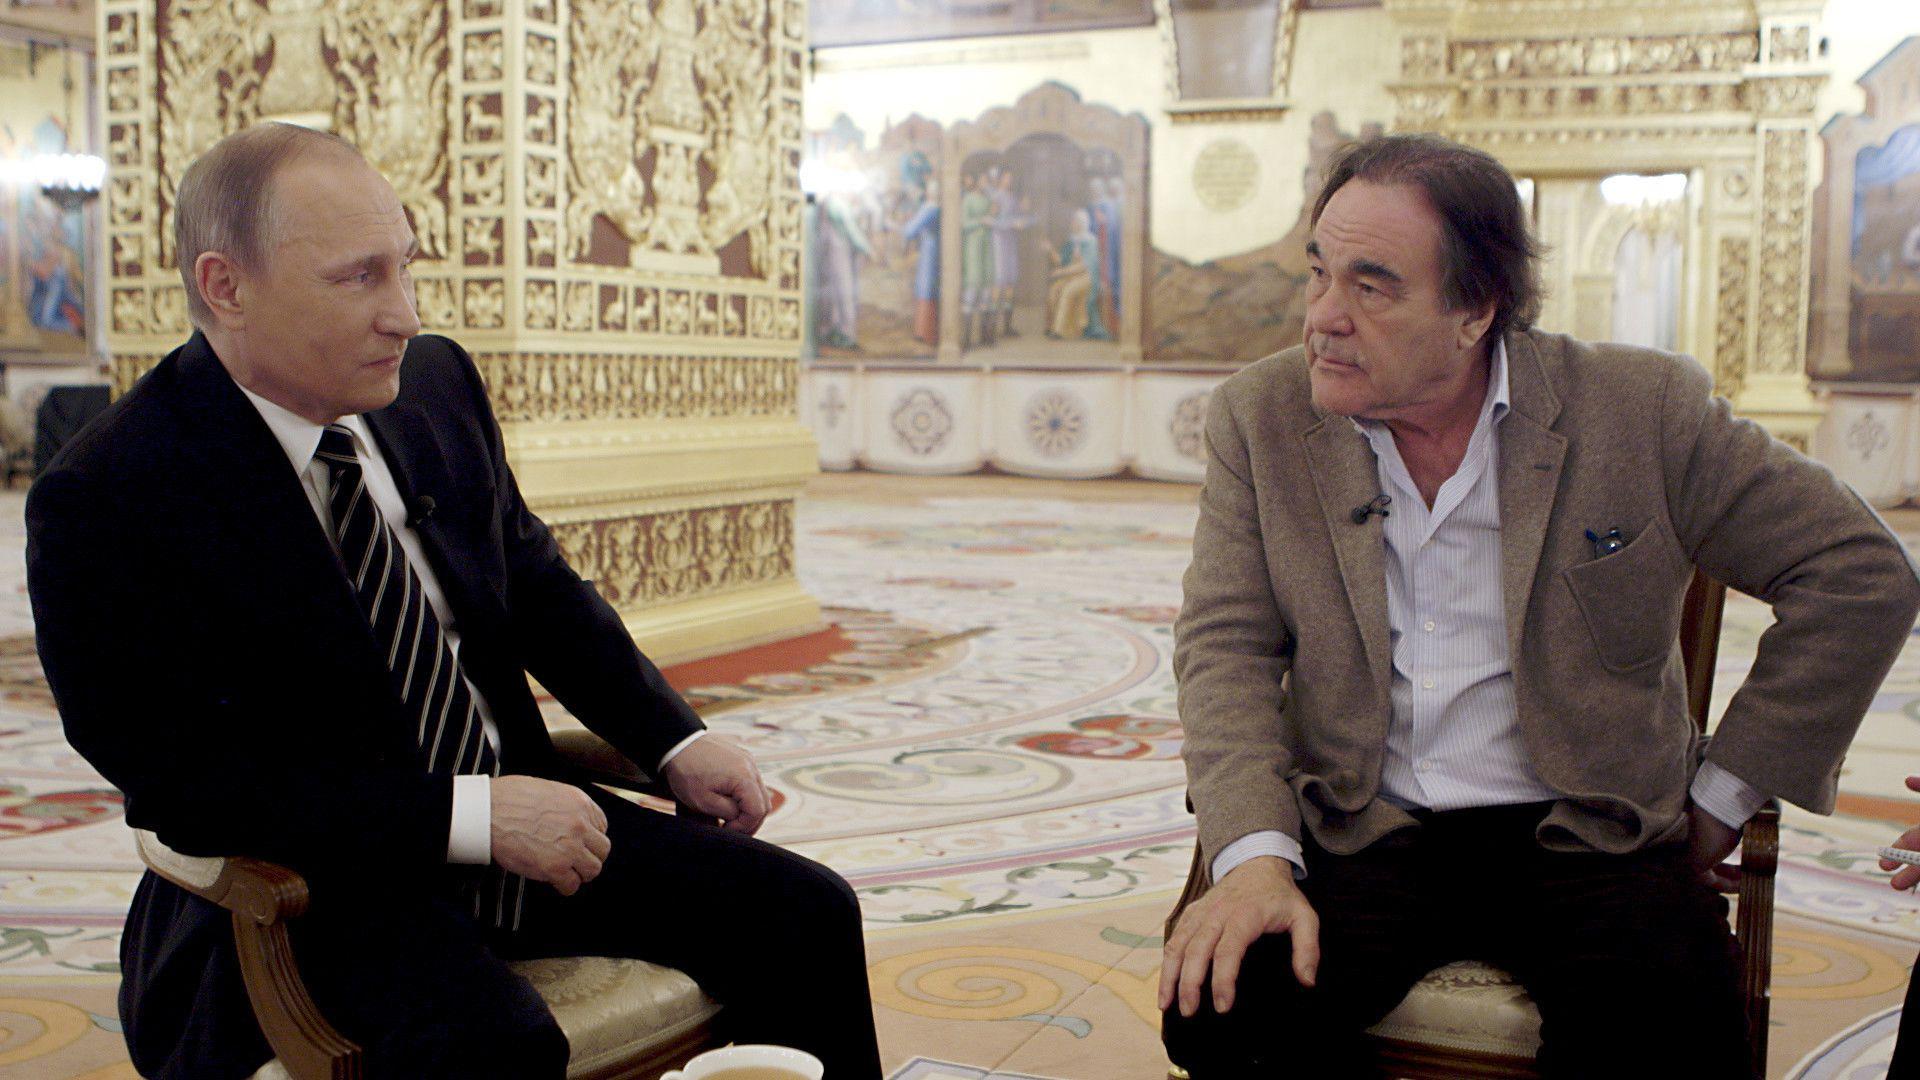 'The Putin Interviews' o projecto que une Vladimir Putin e Oliver Stone